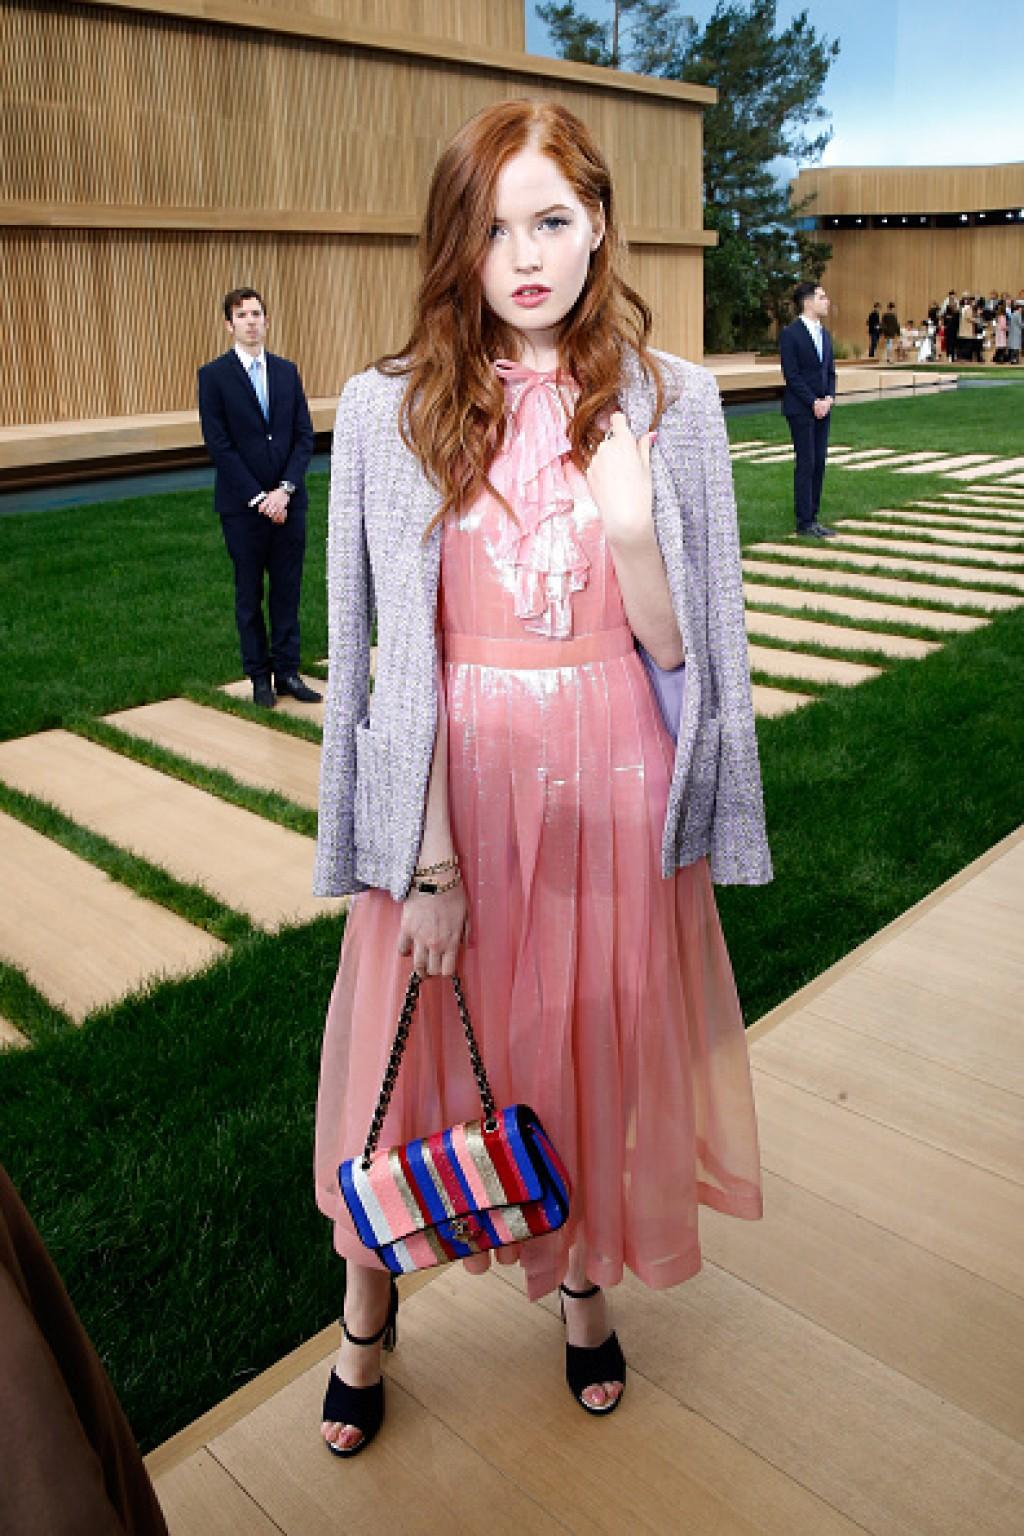 Chanel-Outside-Arrivals-Paris-Fashion-Week-Ellie-Chanel-Dress-Bamnbe-1024x1536-1